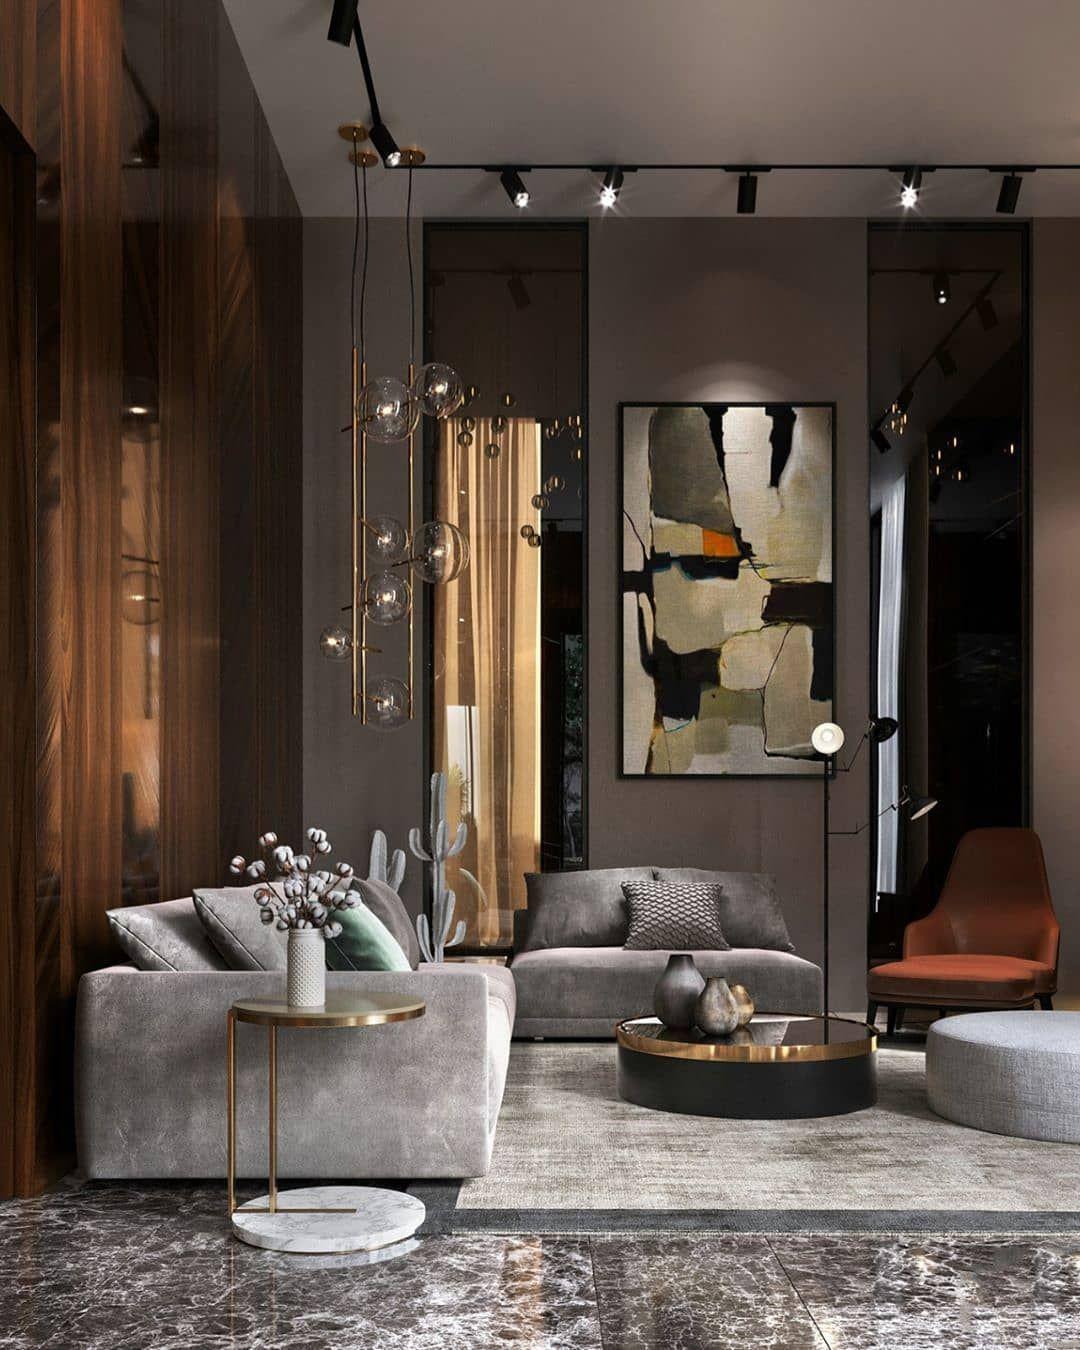 Free Room Design: Living Room Vibes 🖤 Follow For More @unitrenderspace Feel